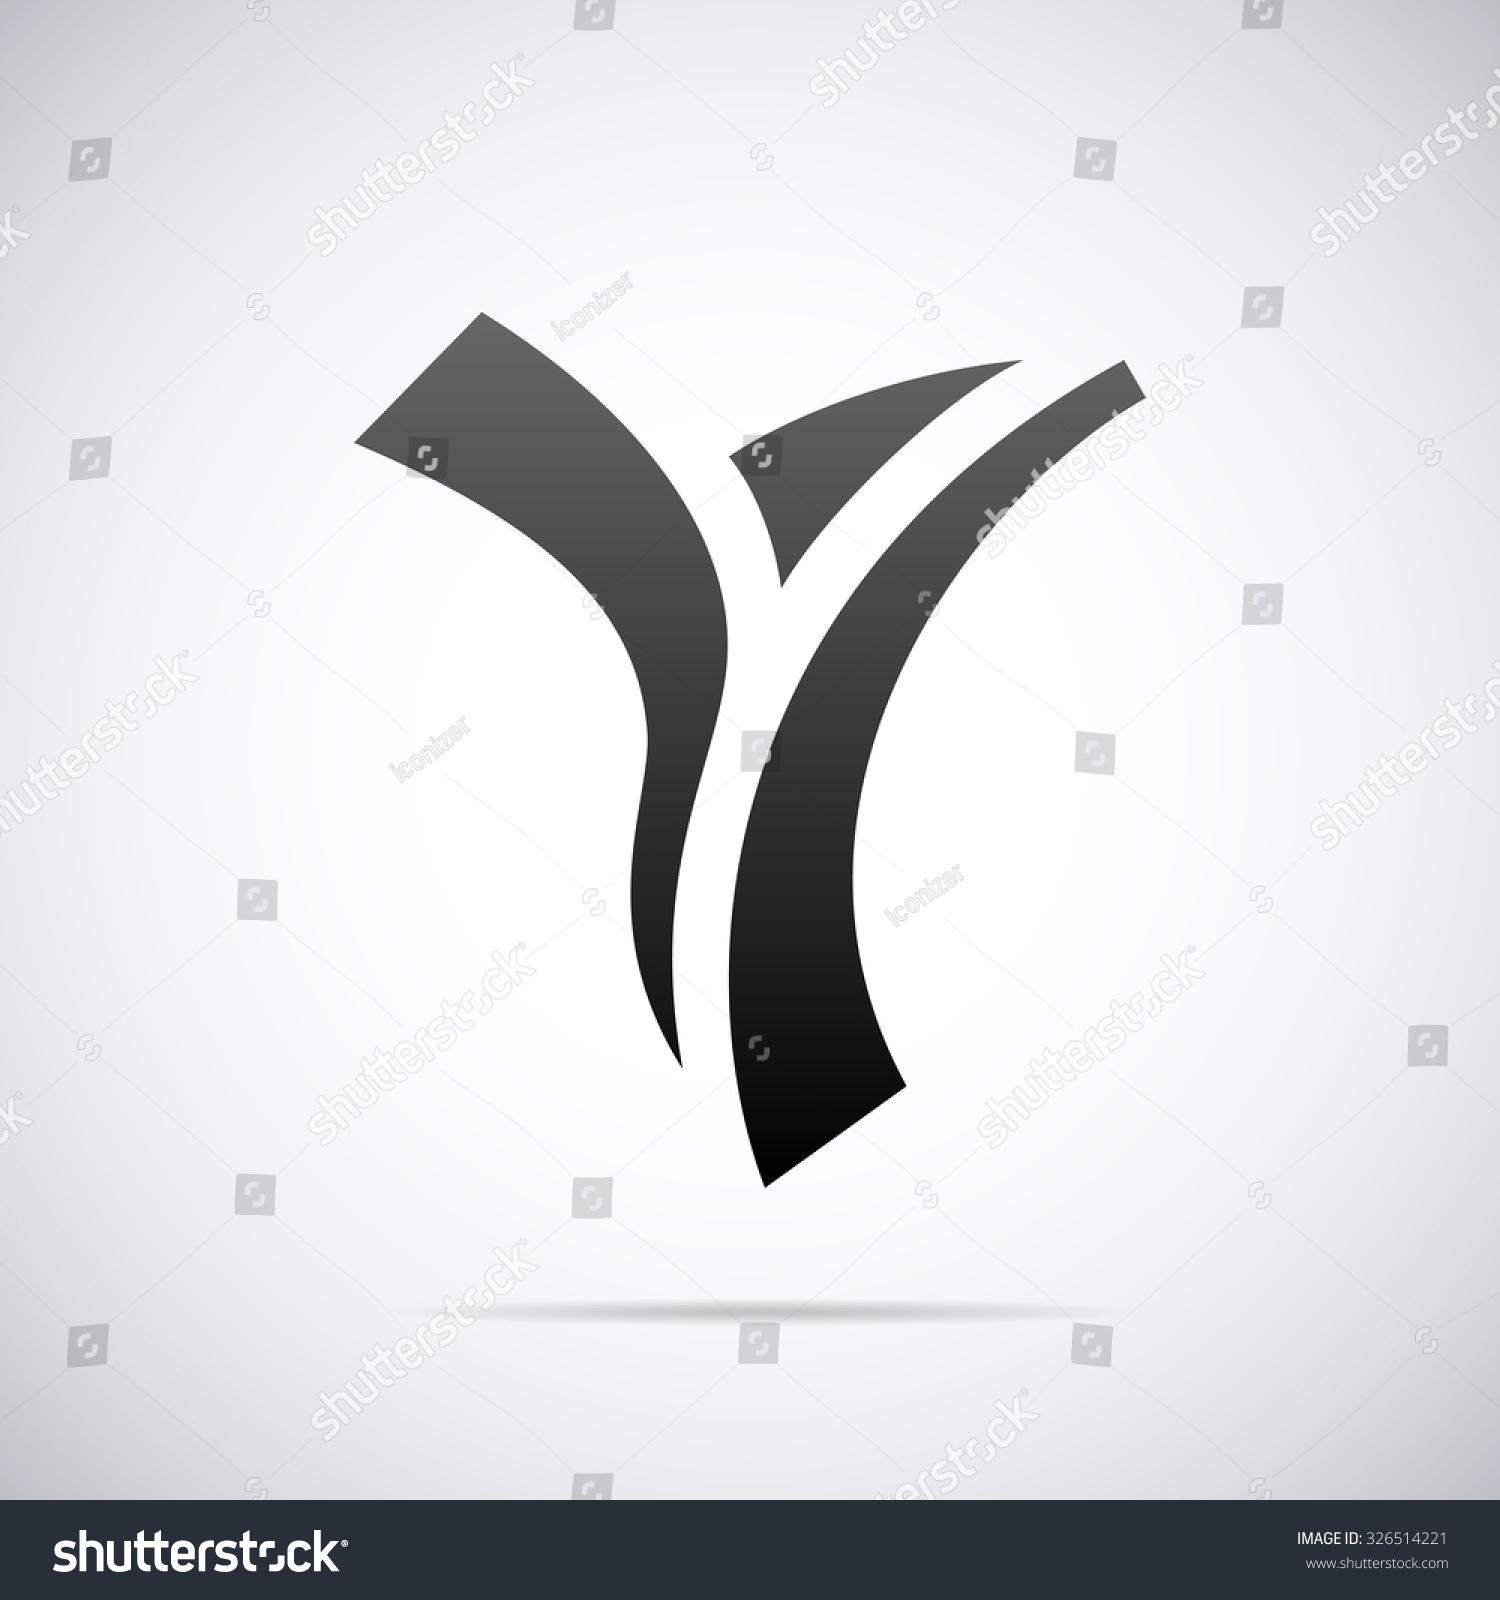 Letter y logo design Photos Graphics Fonts Themes